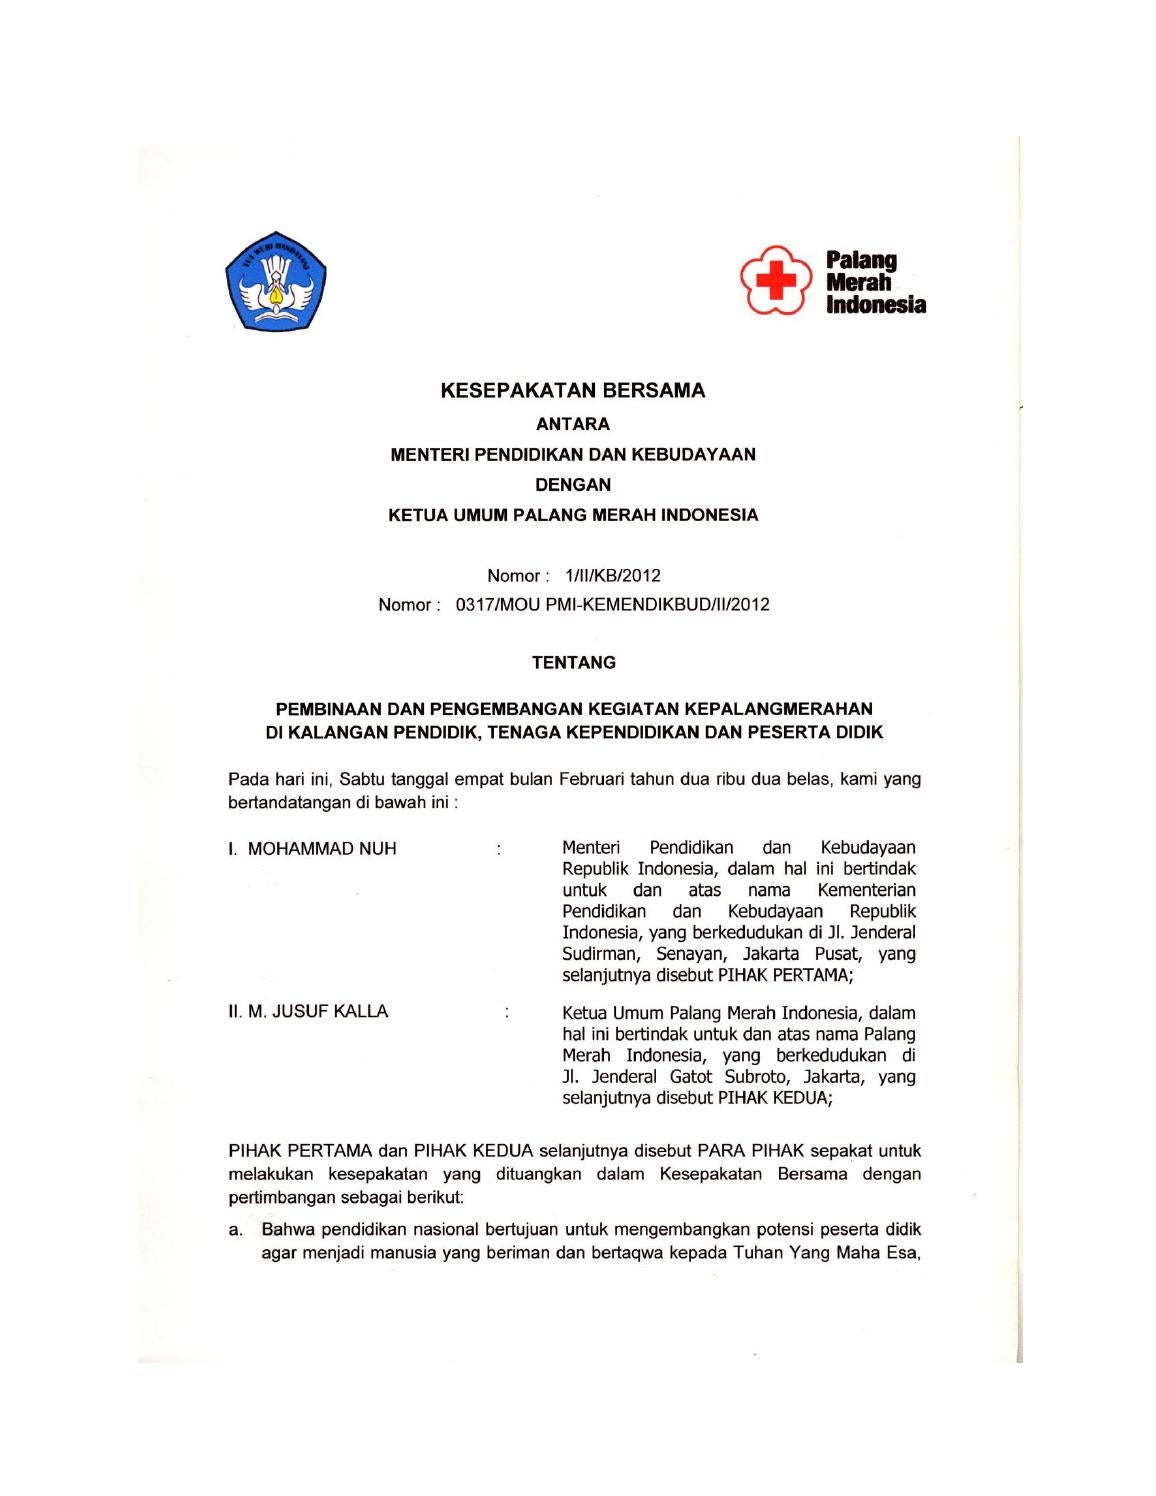 Mou Pmi Kemendikbud 2012 By Palang Merah Indonesia Issuu